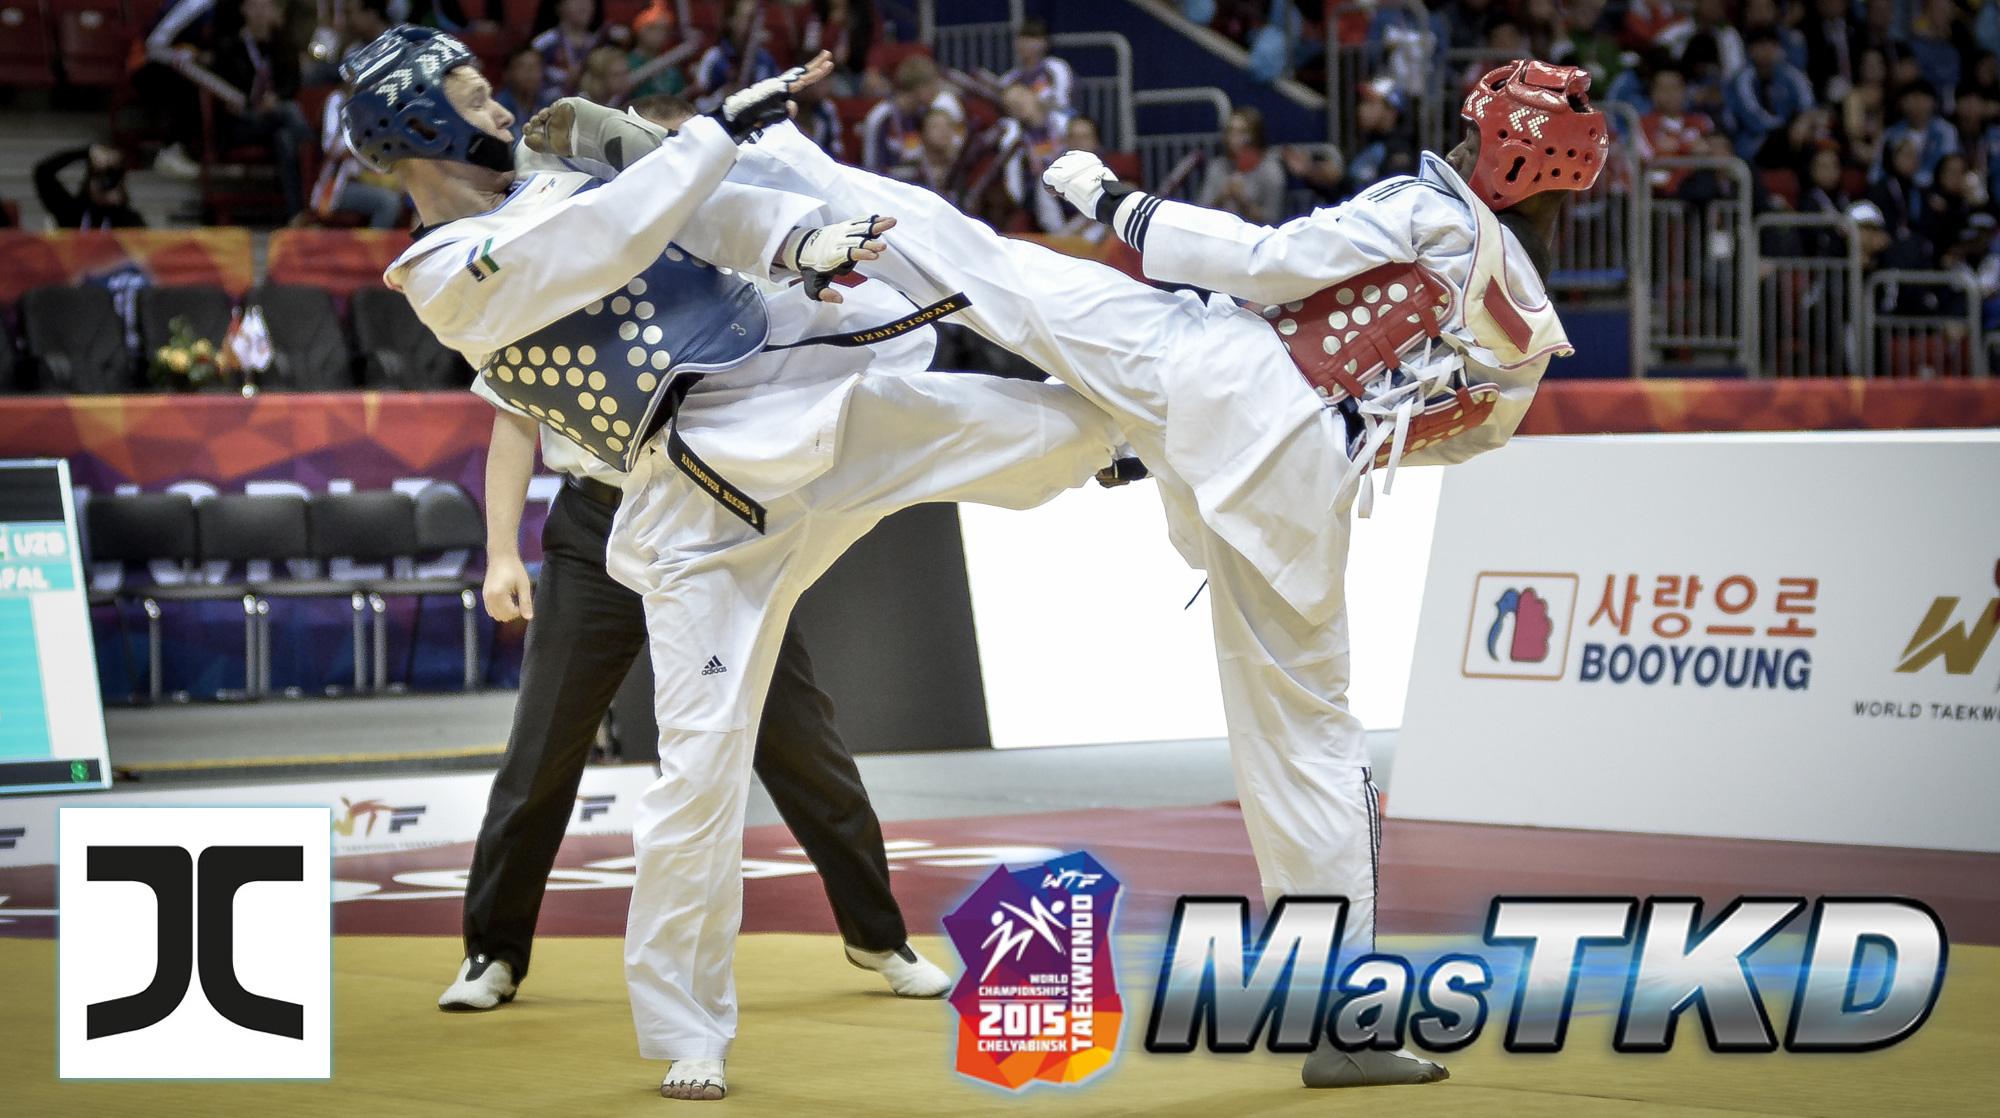 13_Seleccion_JCalicu_Mundial-Taekwondo-D3